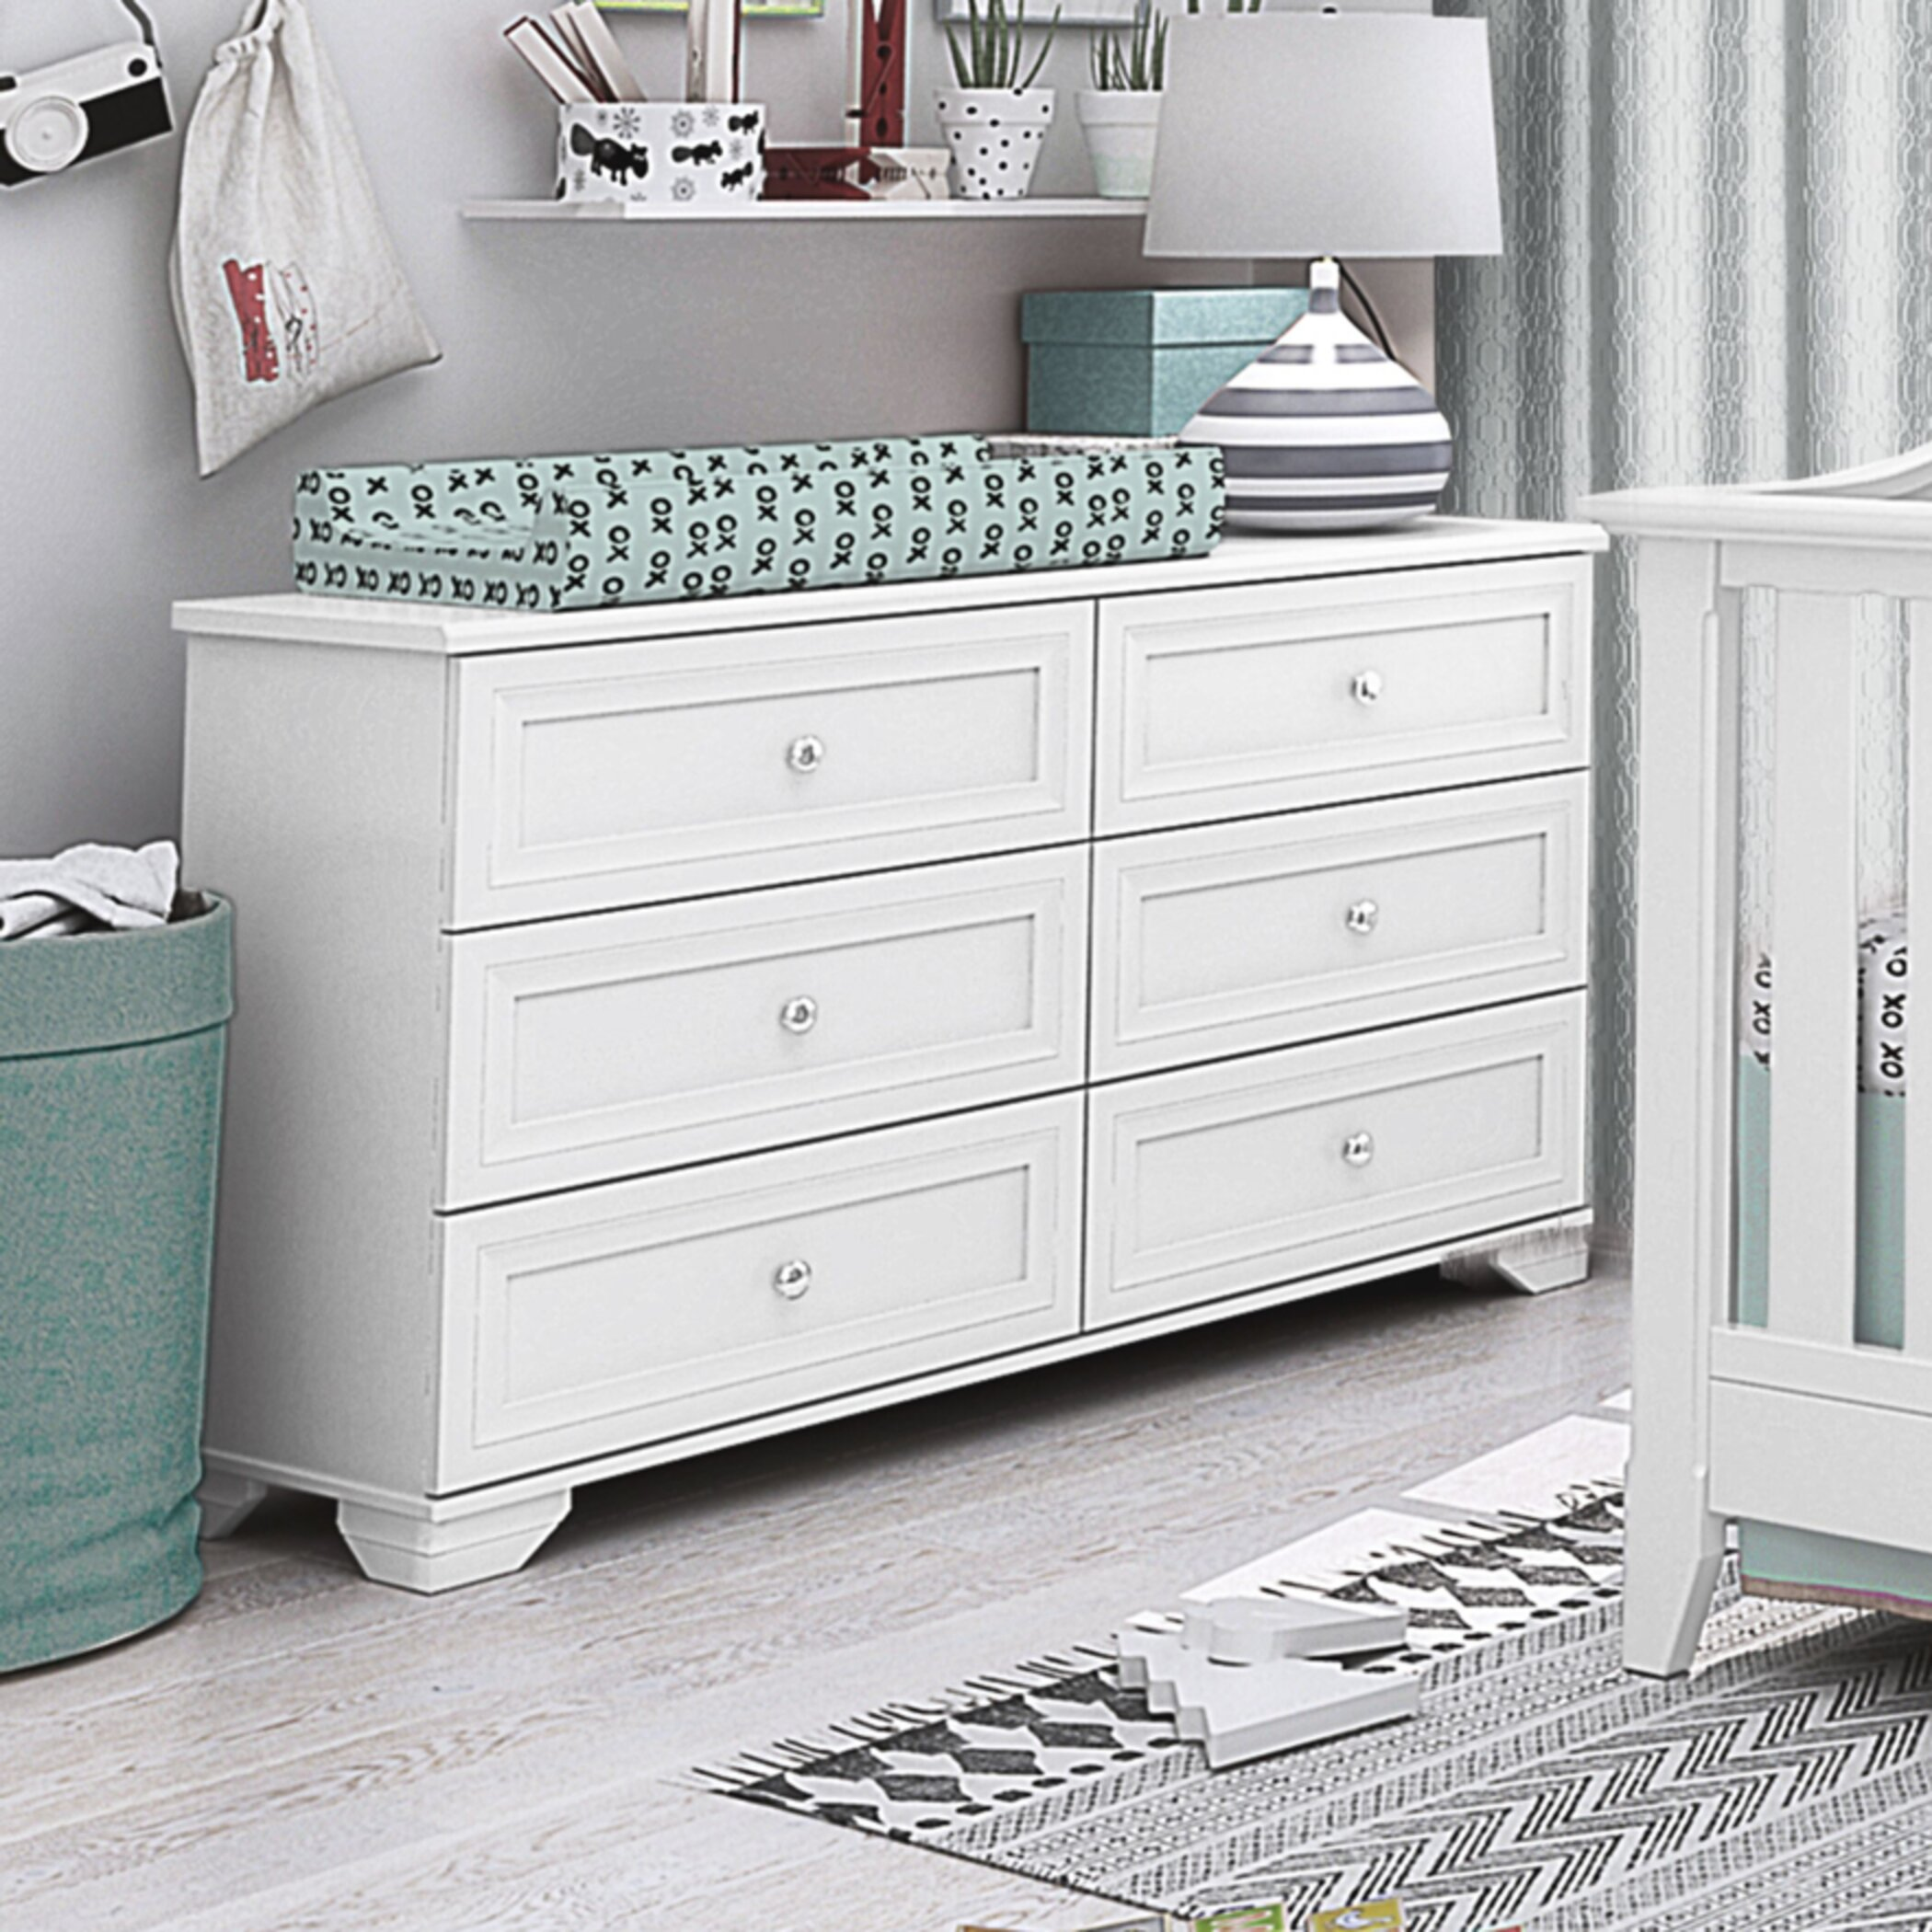 Admirable Child Craft Camden Dresser Wayfair Home Interior And Landscaping Elinuenasavecom